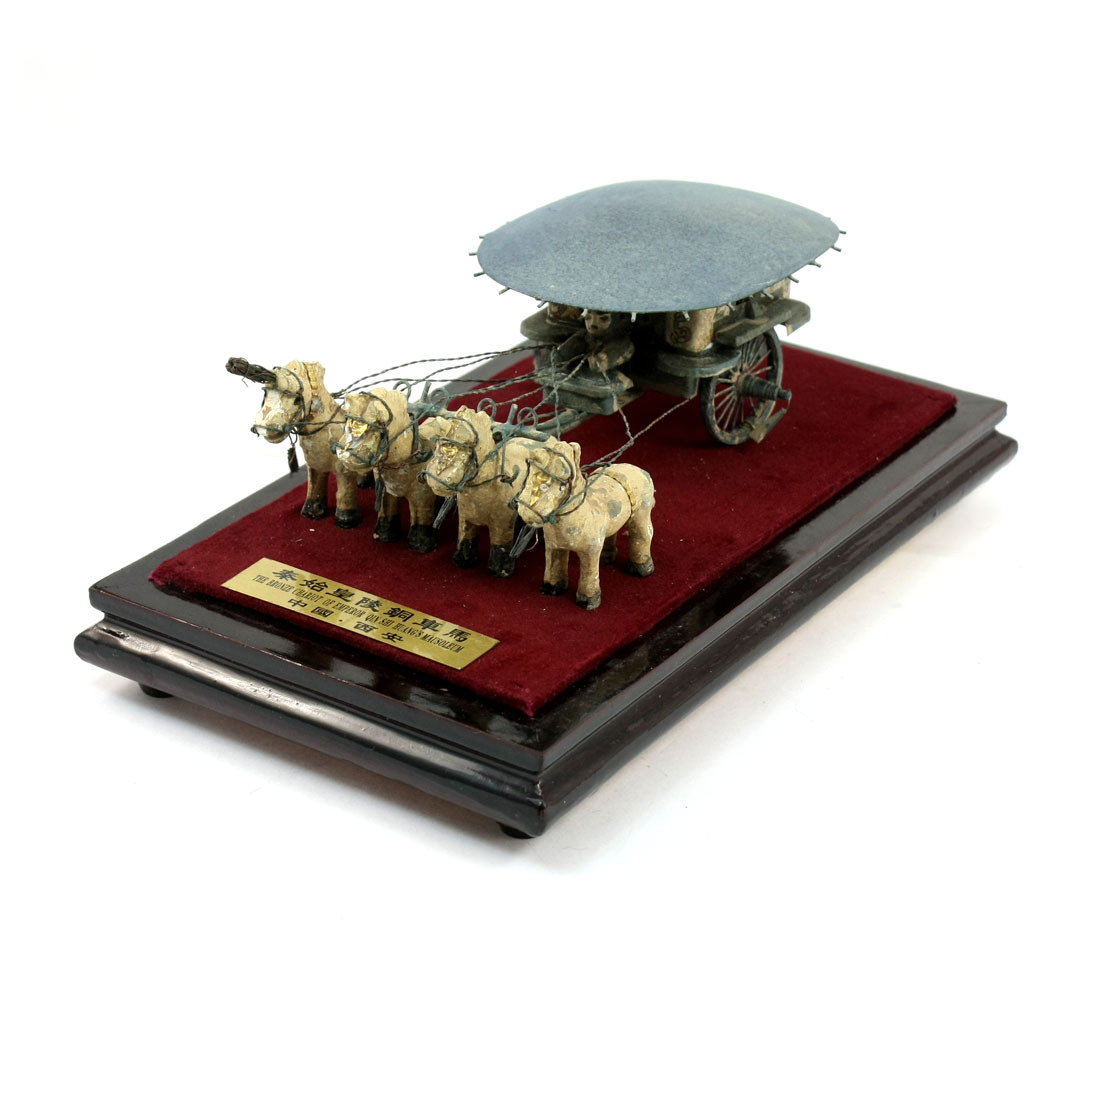 Ancient Emperor Qin Shi Huang Mausoleum Horse Chariot Model Figurine